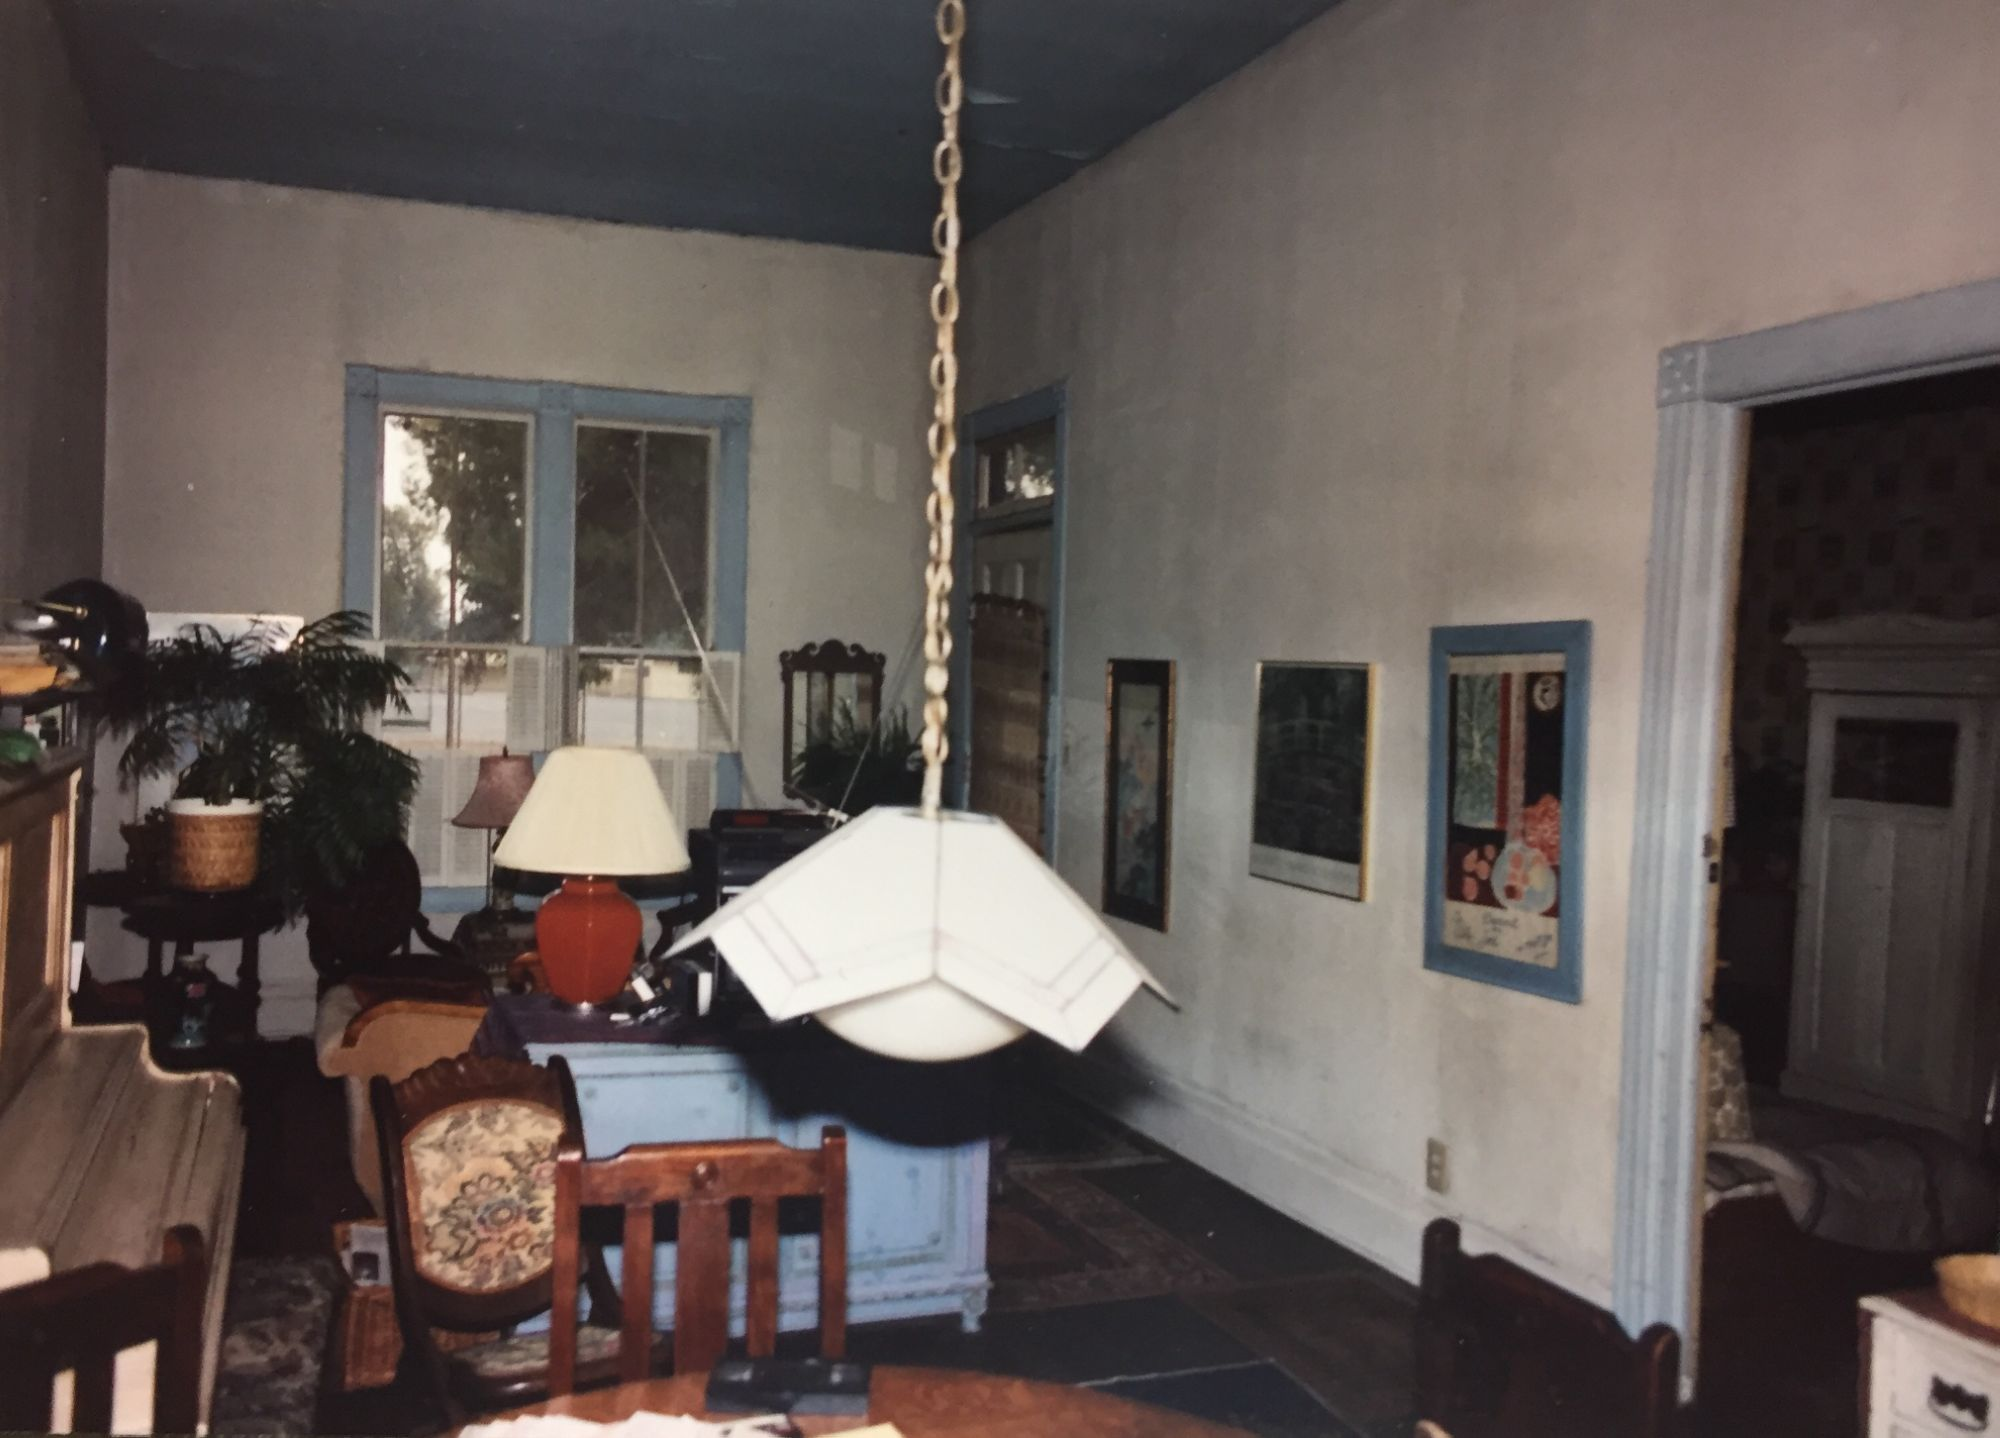 05-Adams-childhood-living-room-2.jpg